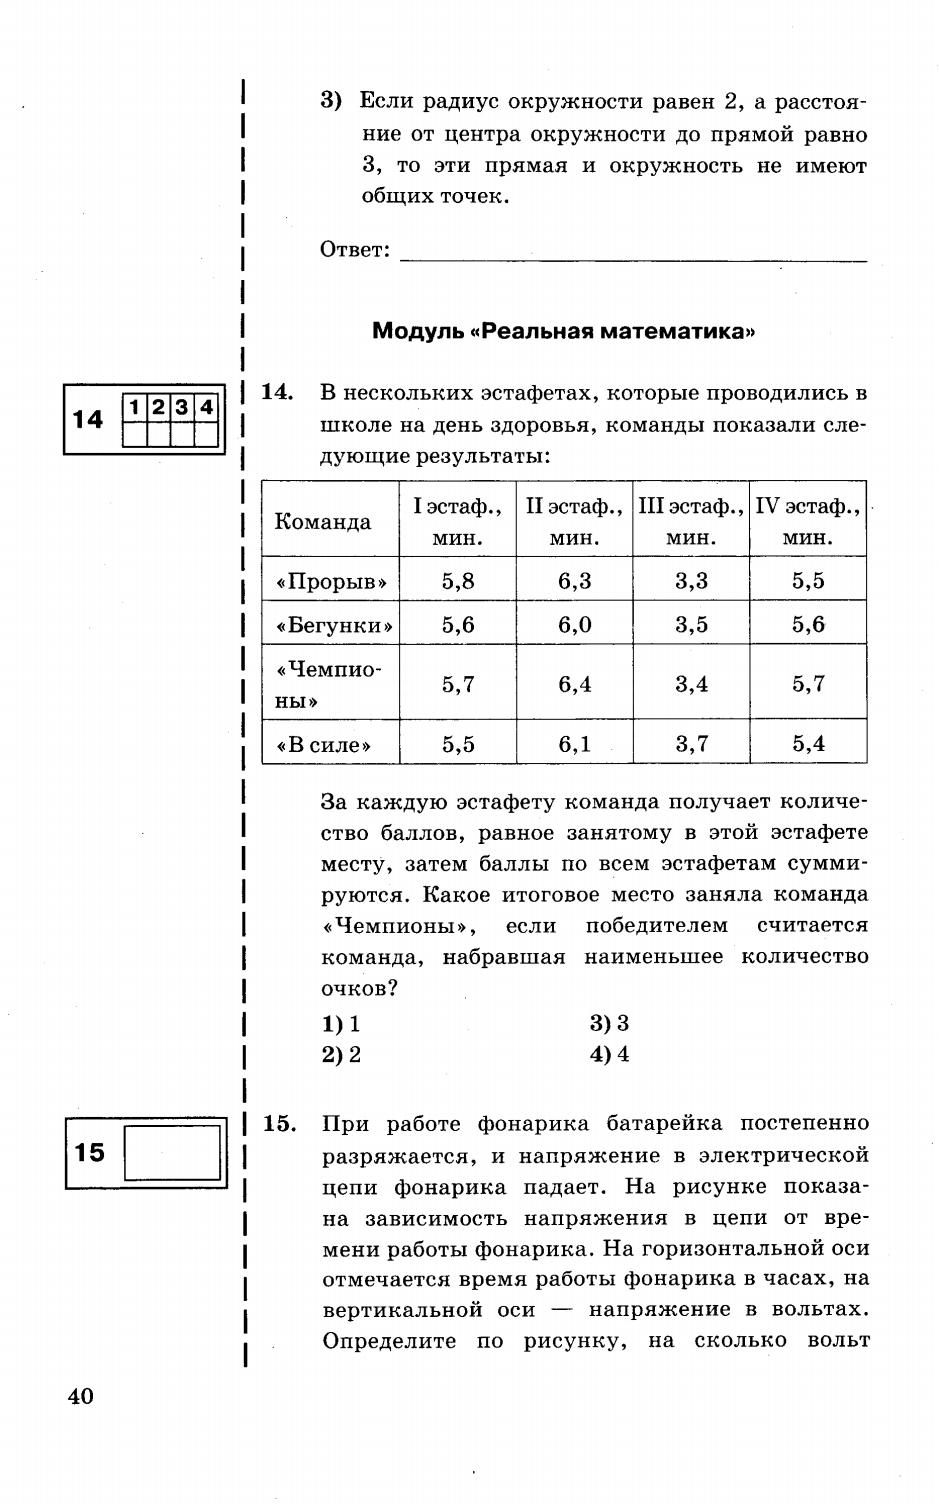 https://docs.google.com/viewer?pid=explorer&srcid=0Bw_f54pvrxEtbldKNGgyaFE3TDg&chrome=false&docid=e803bf4555b2fe7a8e01072ad16bc93b%7Cc9acad21277b9c8c76d1236b5bcea6e2&a=bi&pagenumber=41&w=939